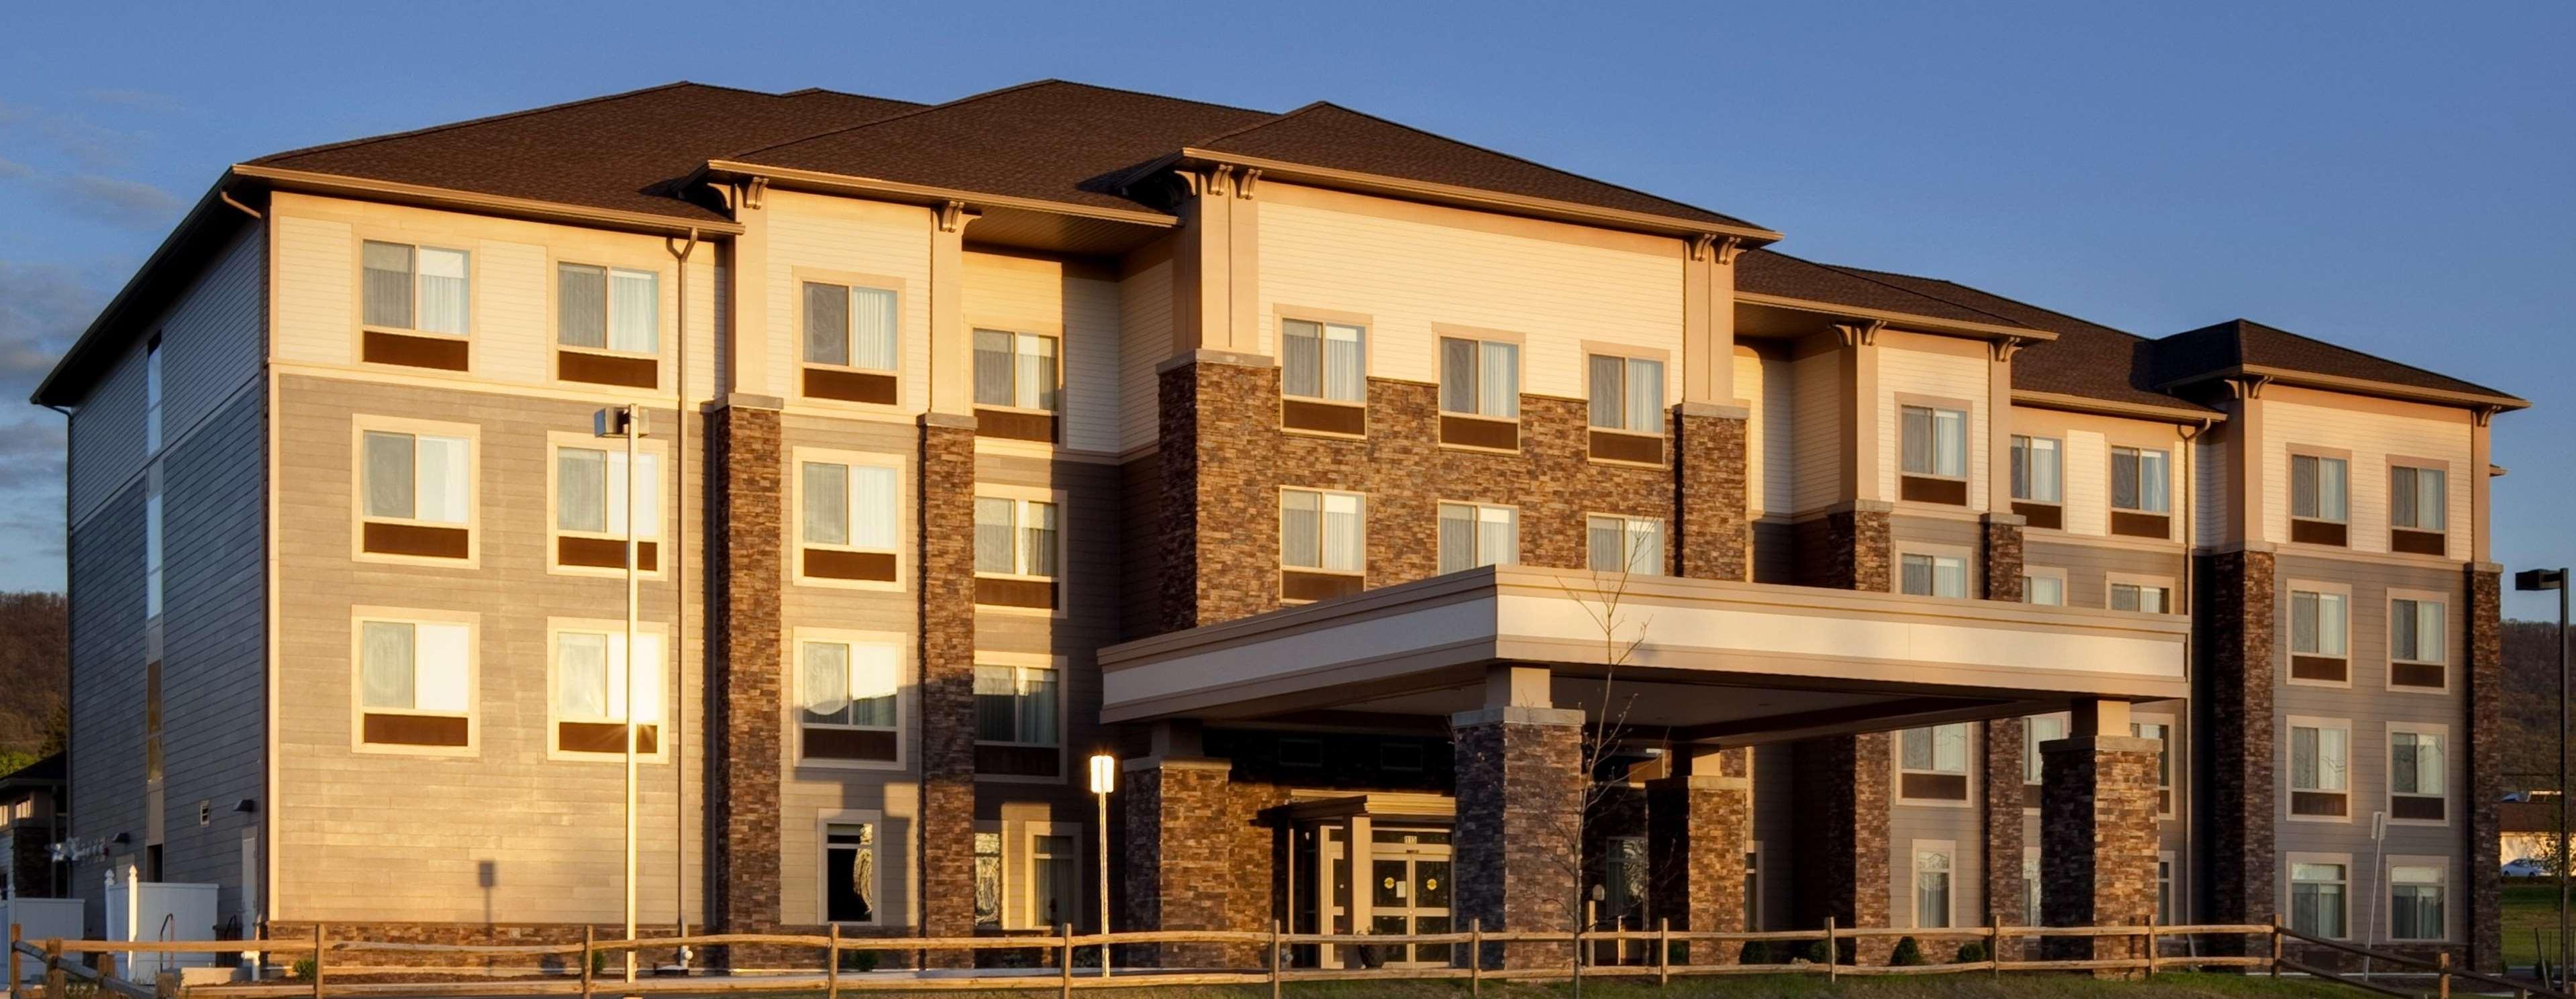 Best Western Plus University Park Inn & Suites image 12